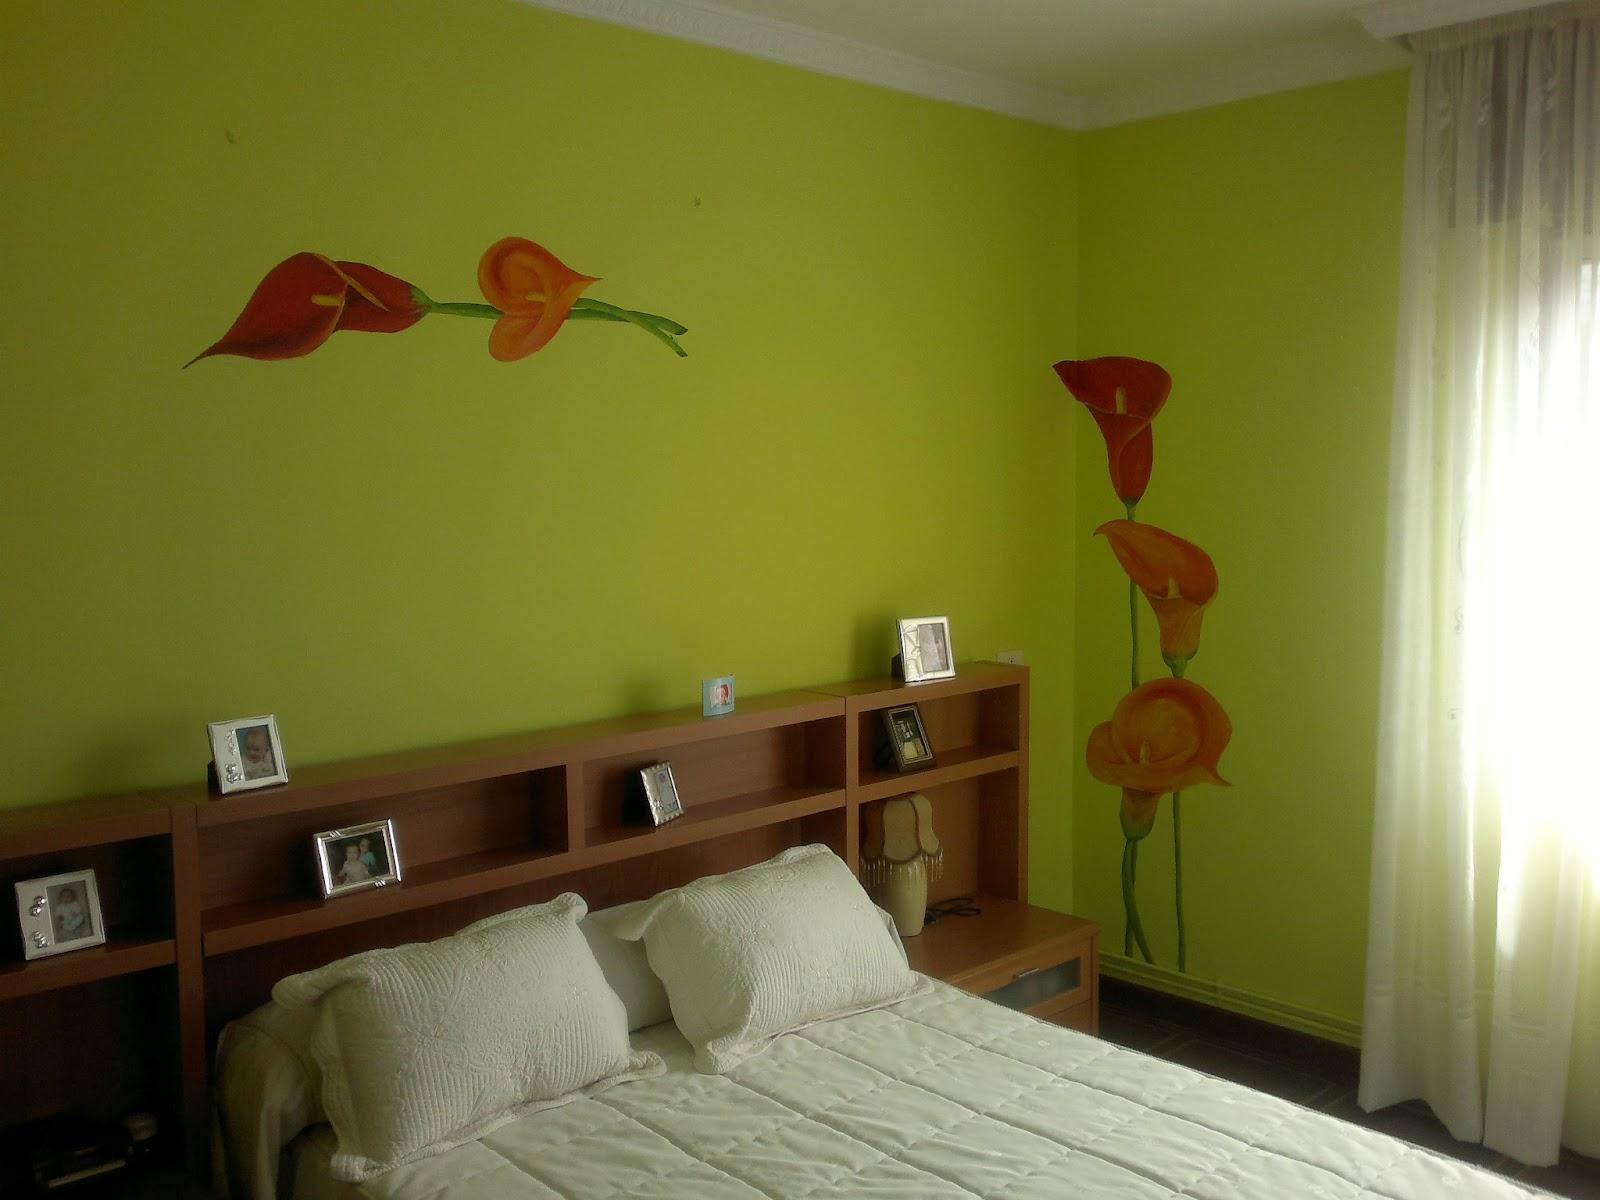 Las cosas de paula en verducido mural habitaci n - Mural para habitacion ...